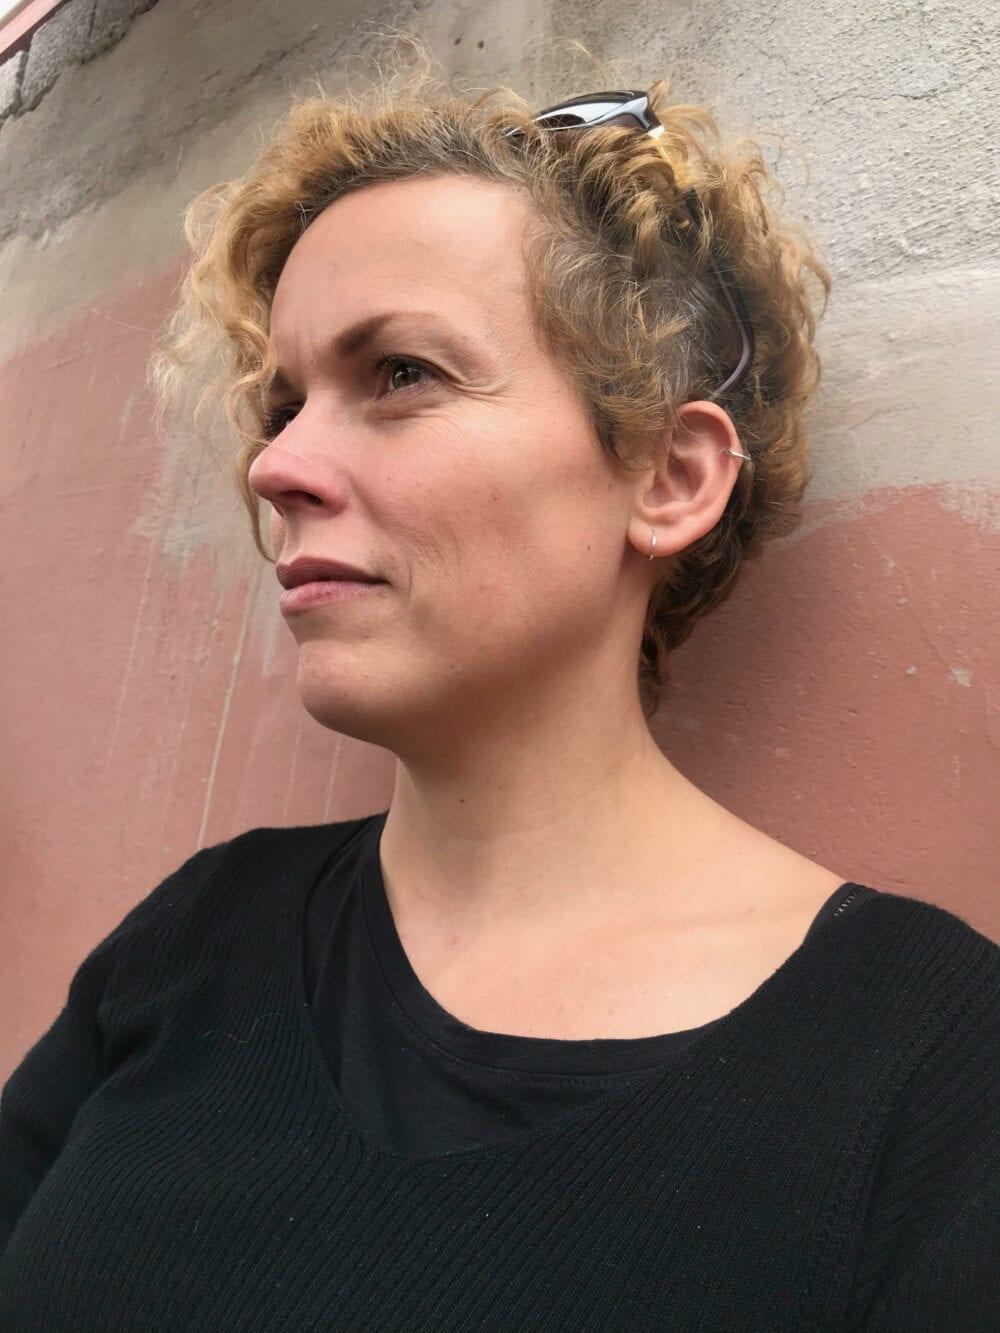 Liselotte Vercaigne